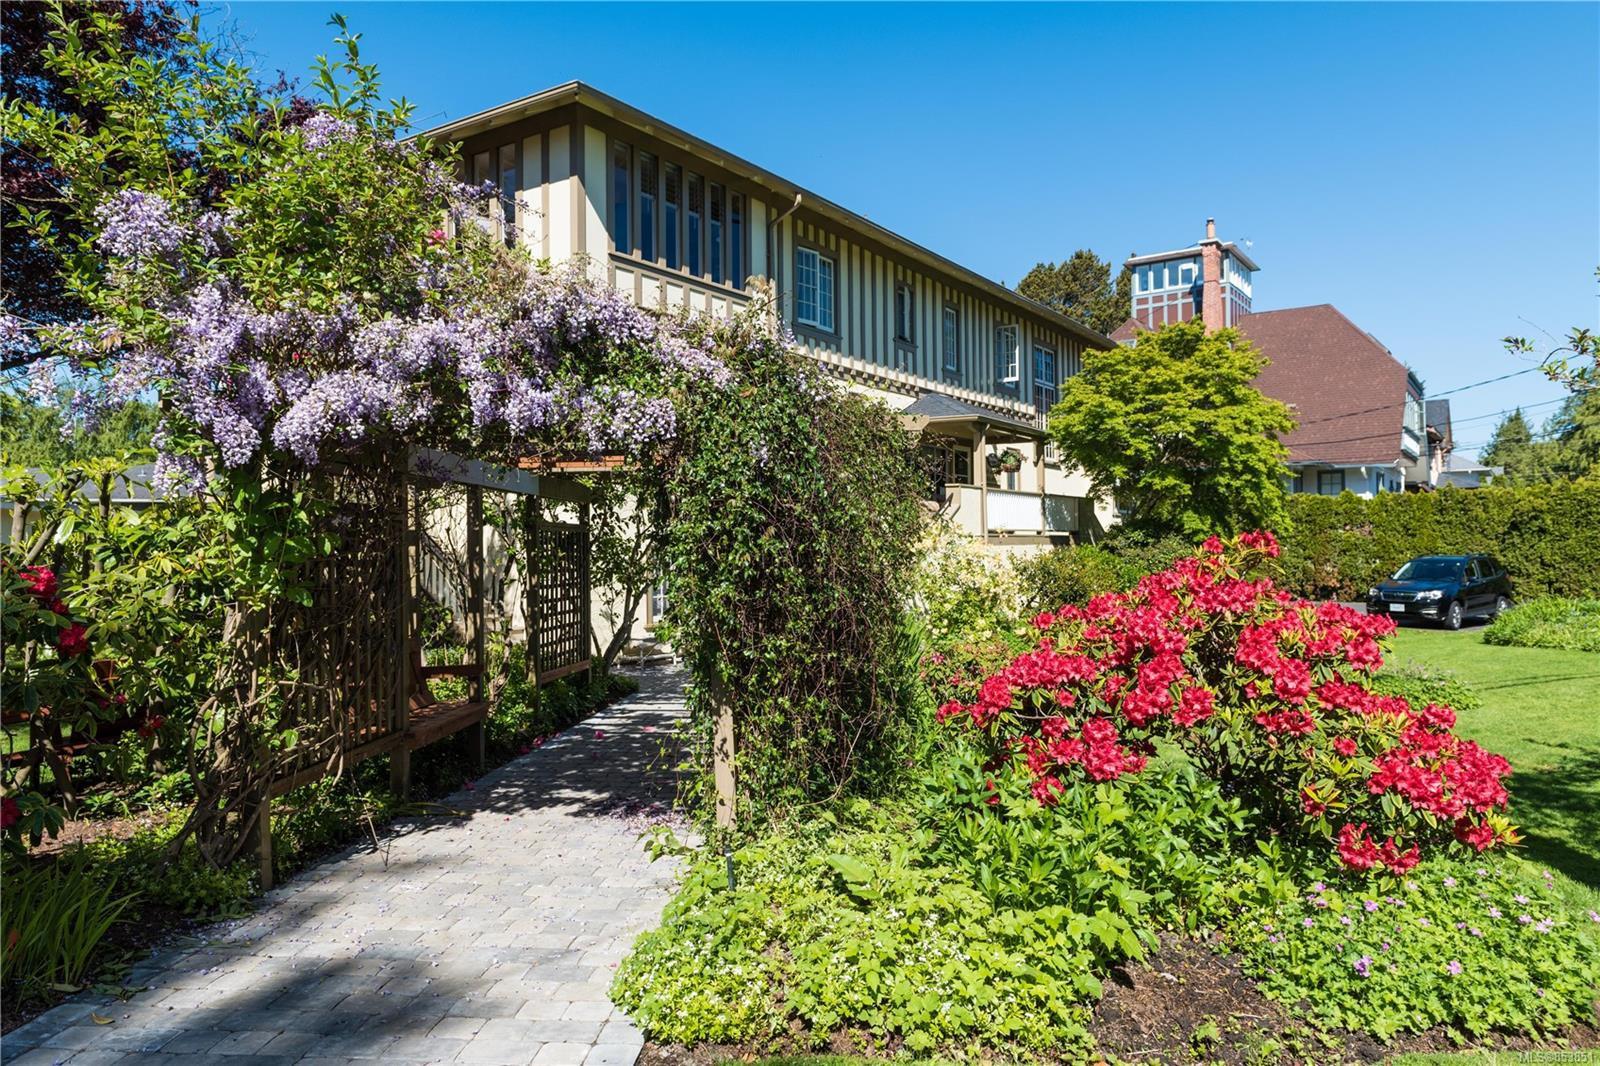 Main Photo: 1052 Newport Ave in : OB South Oak Bay Multi Family for sale (Oak Bay)  : MLS®# 853851